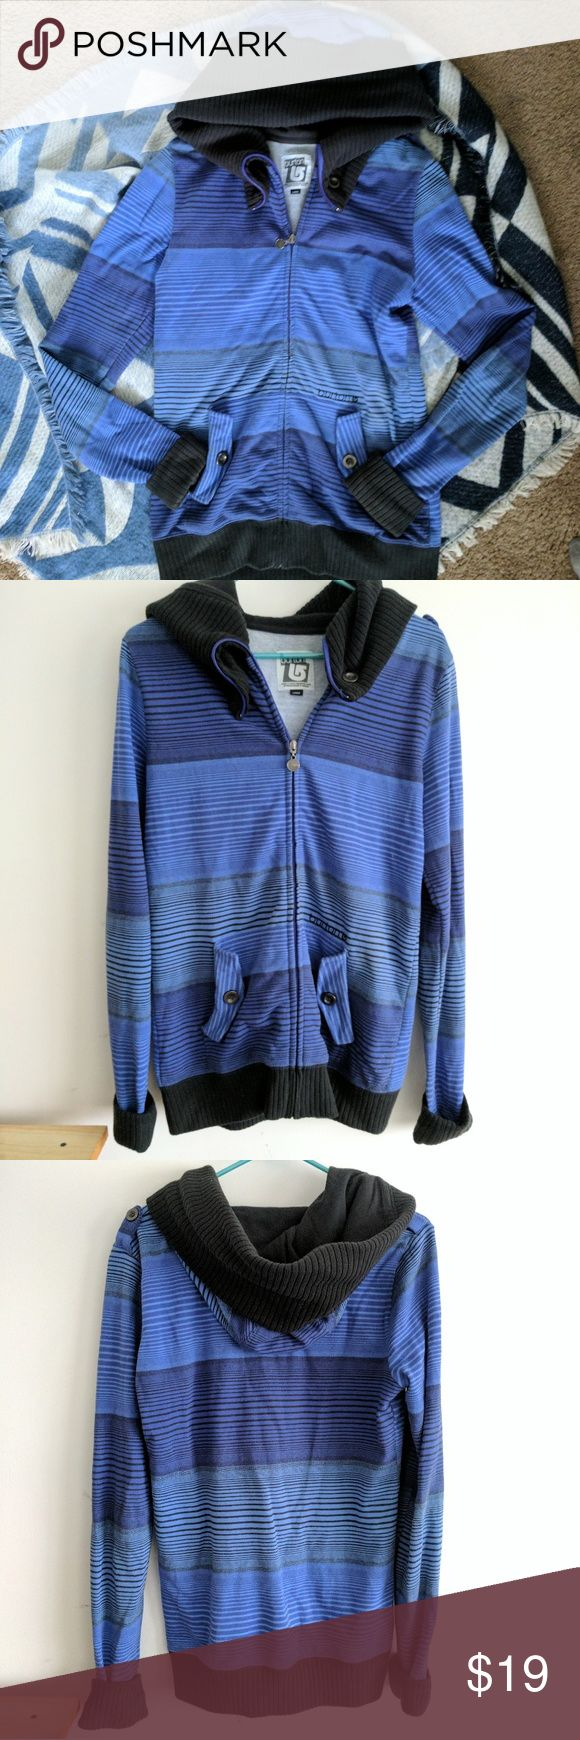 Women's Burton zip up sweatshirt Blue purple stripped full zip up hoodies sweatshirt. Size large but fits like a comfortable medium. Burton Sweaters